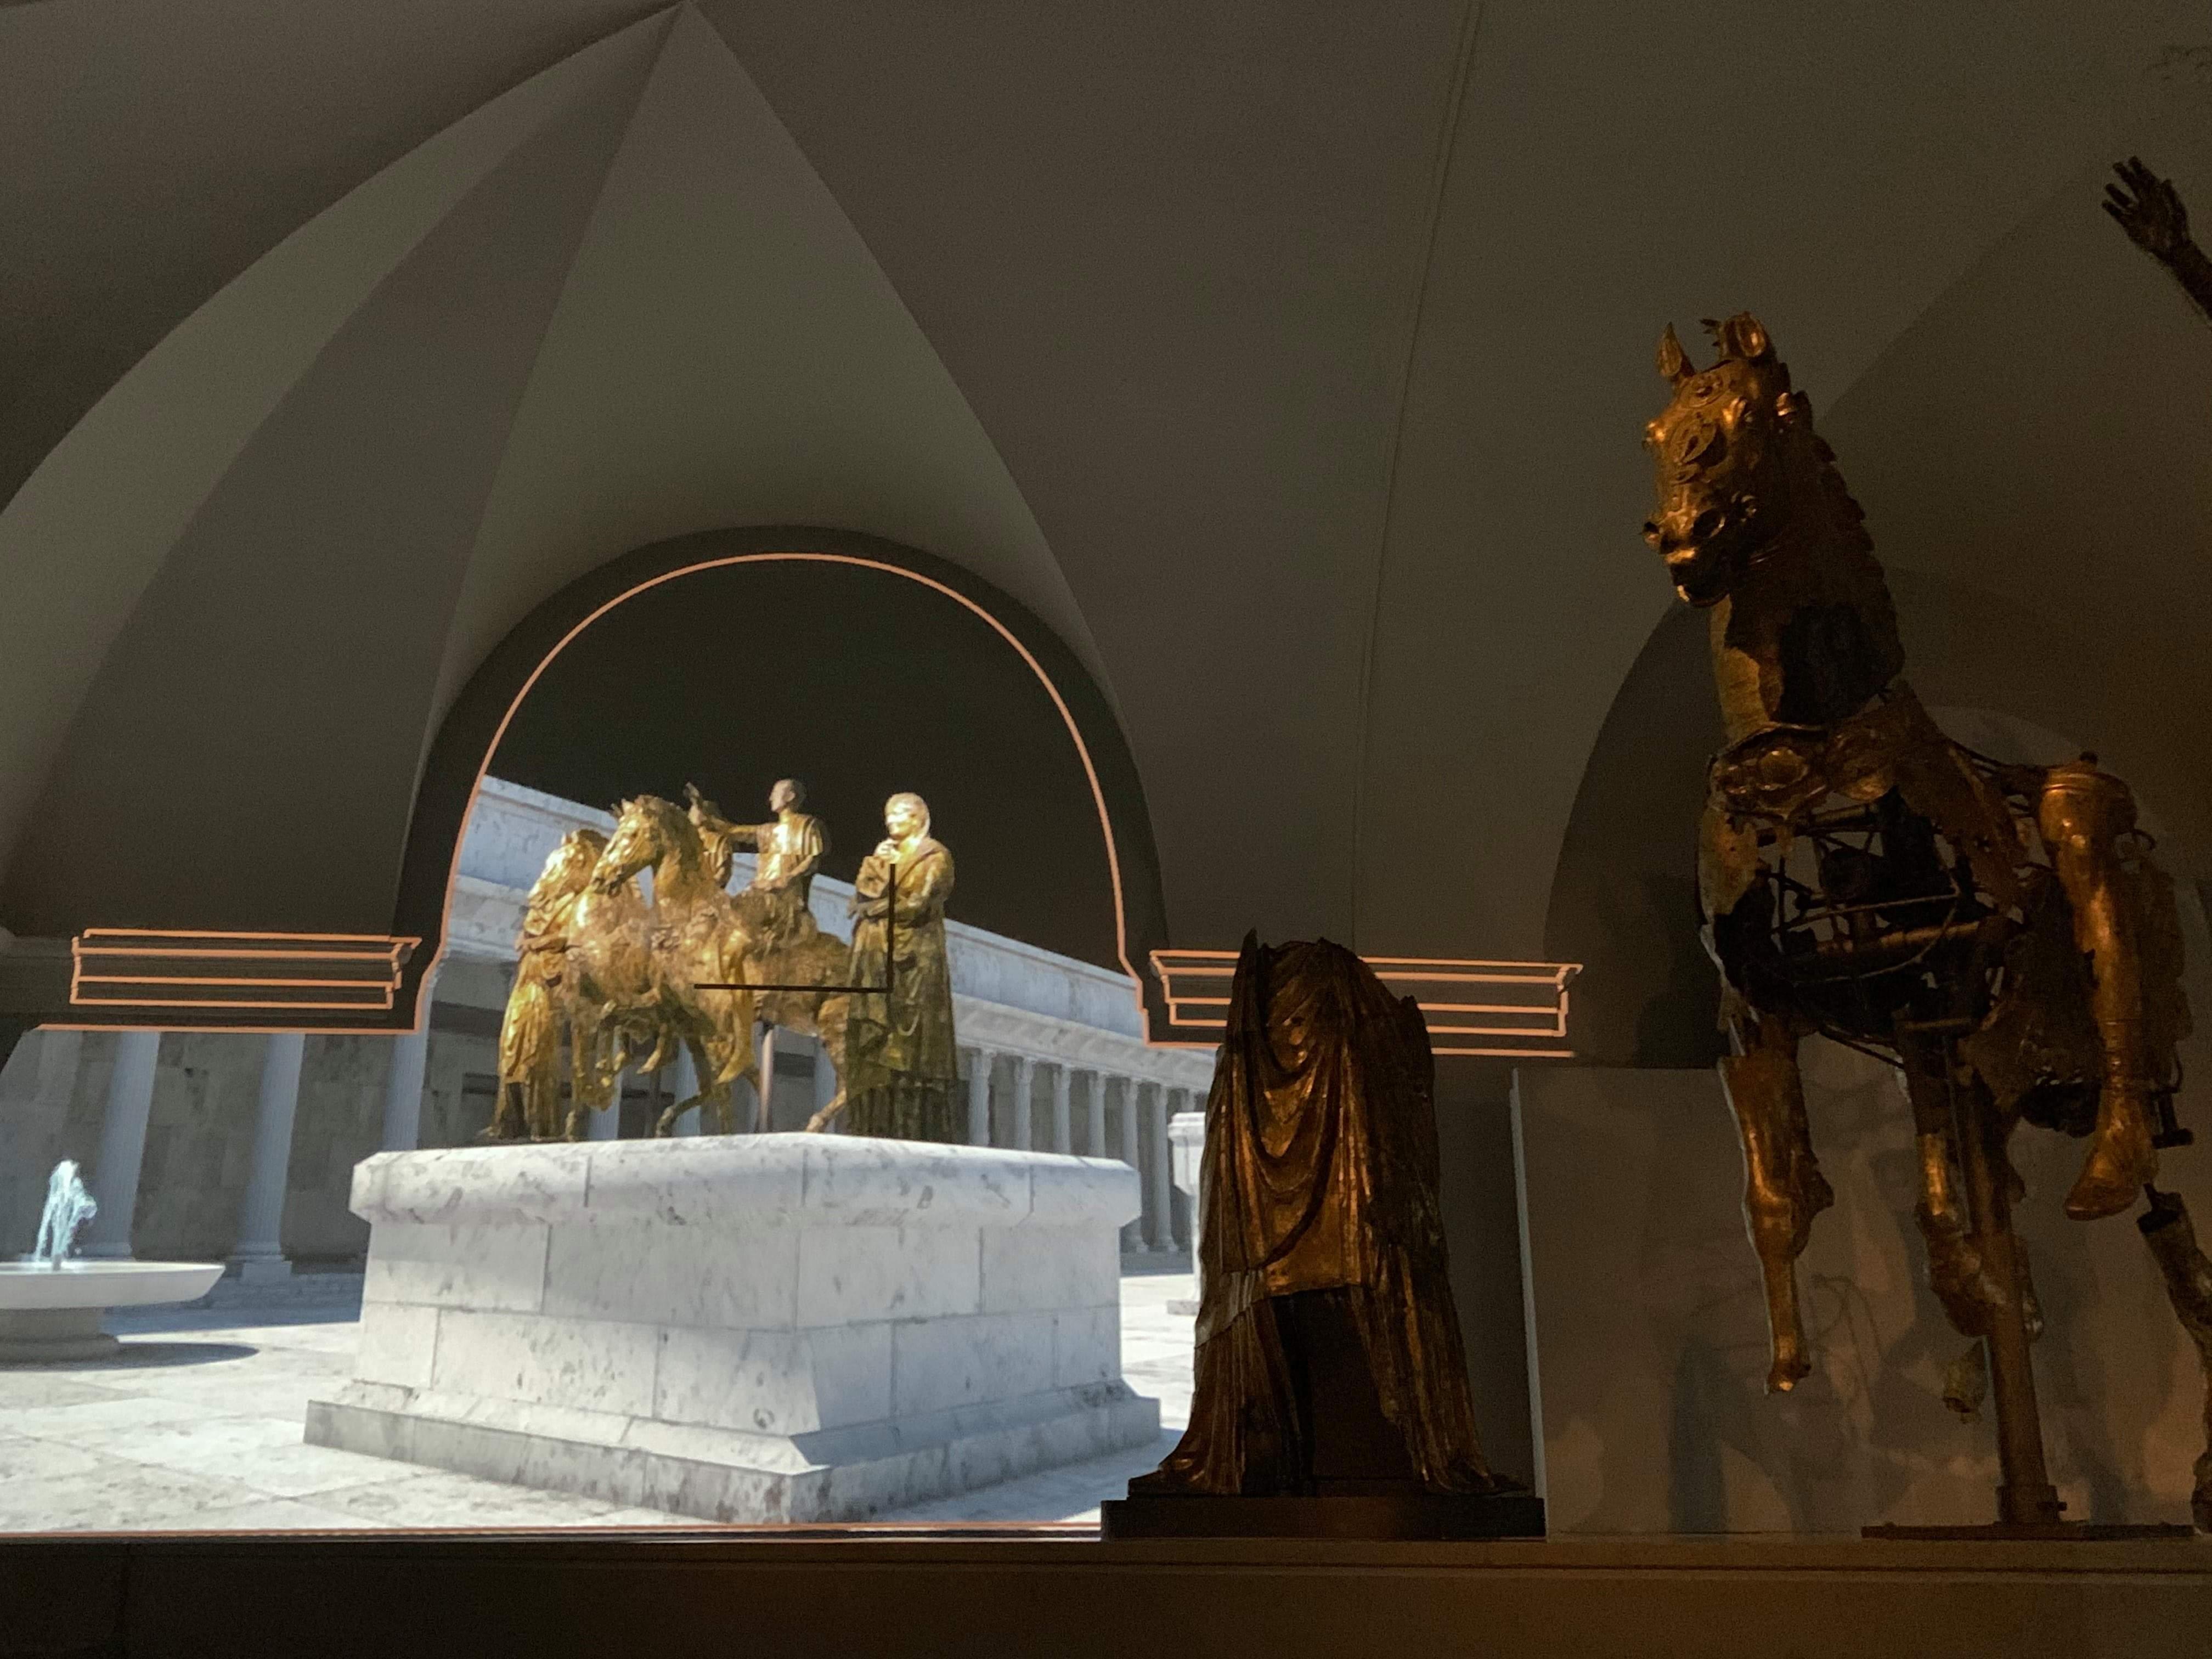 bronzi di pergola-sala immersiva